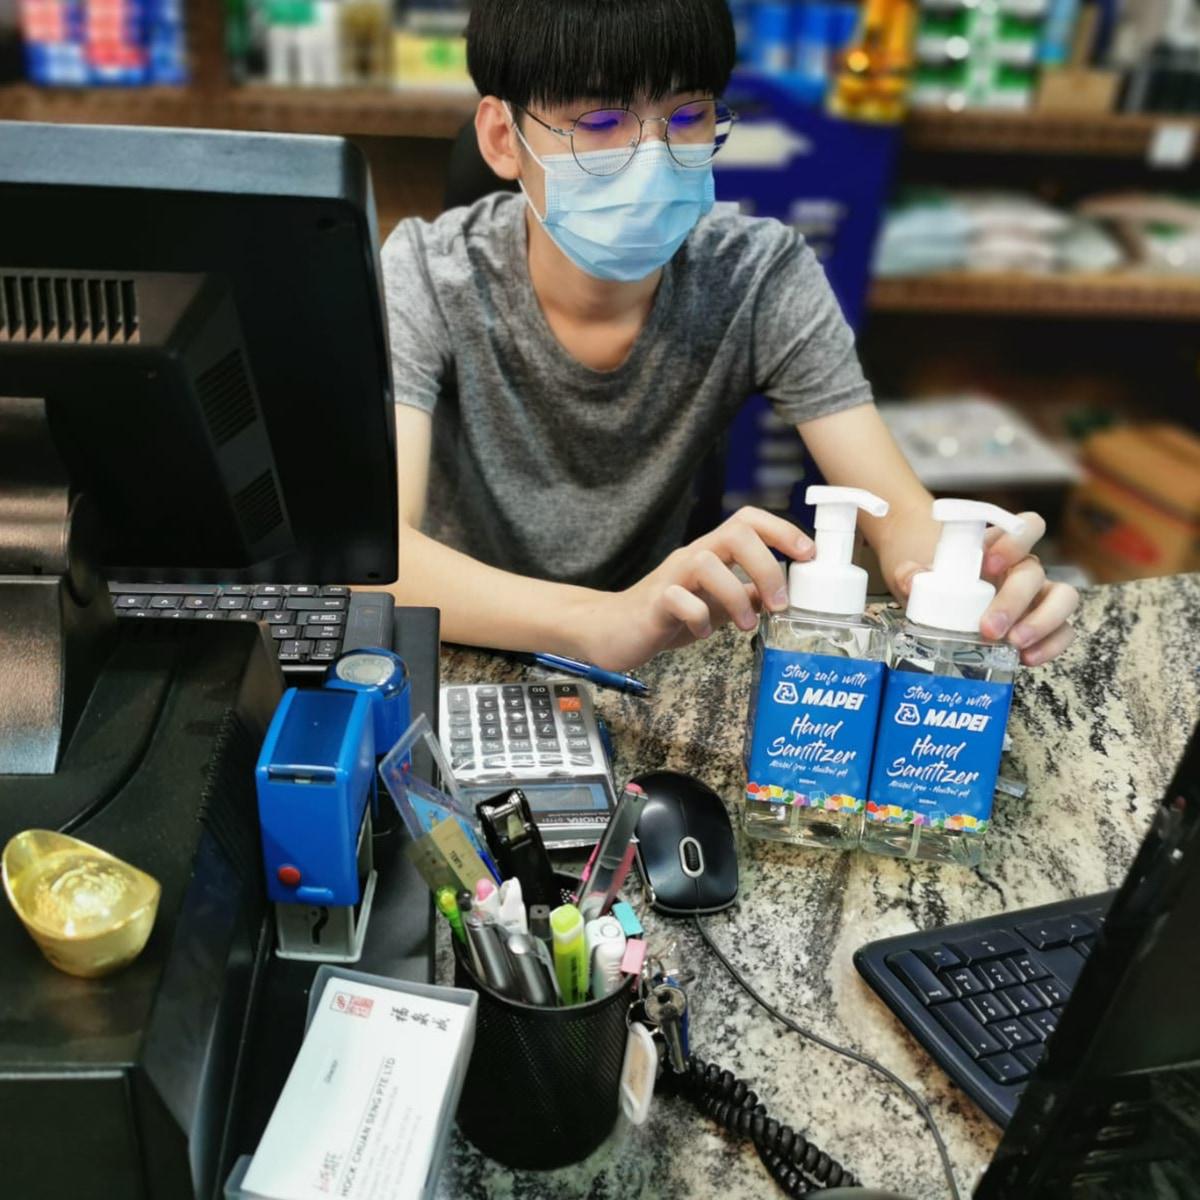 Mapei-+-Client_Hand-Sanitiser-11